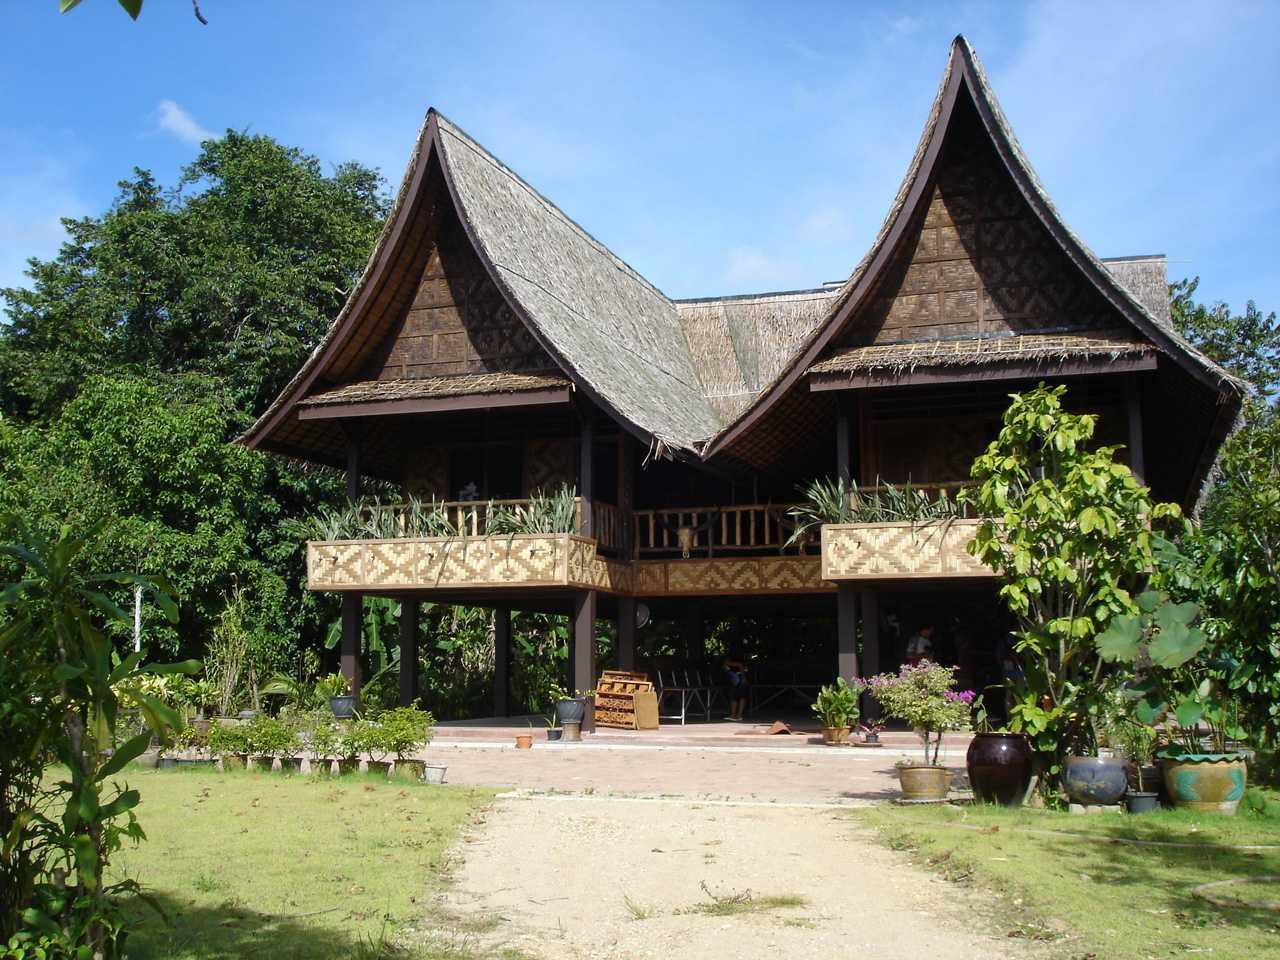 Rumah tradisional Thailand (Sumber: pinterest.com)